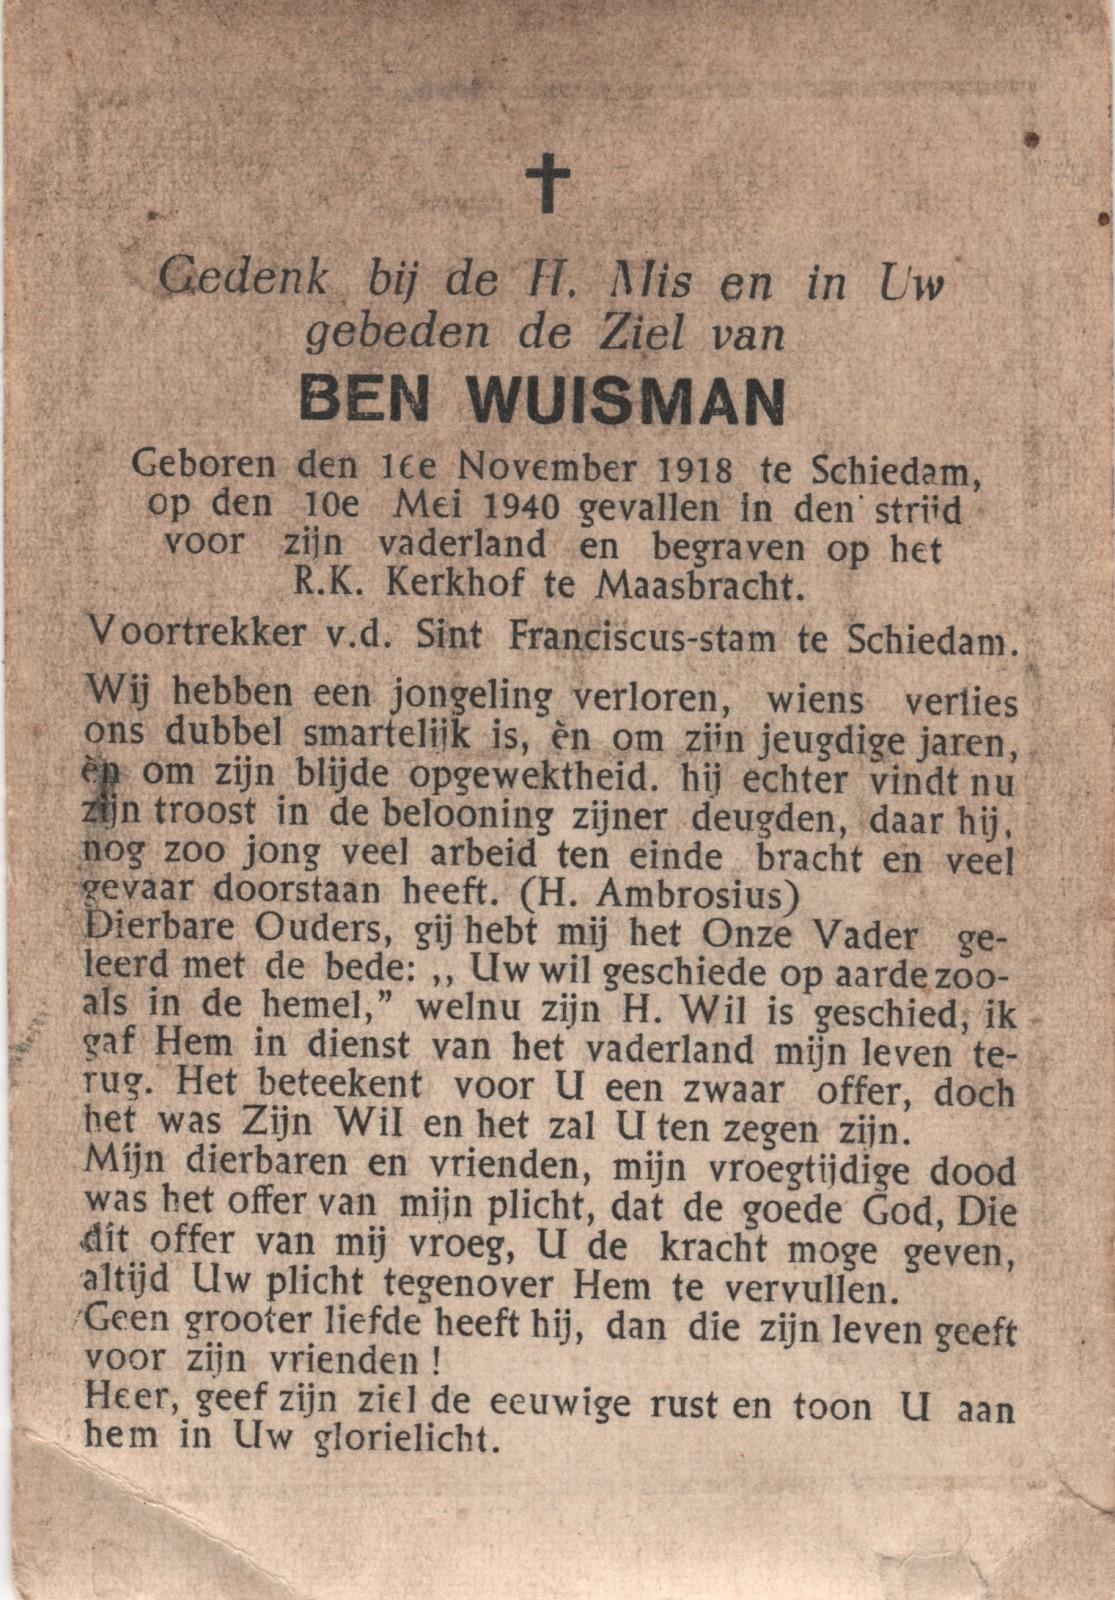 Bernardus Petrus Henricus Wuisman